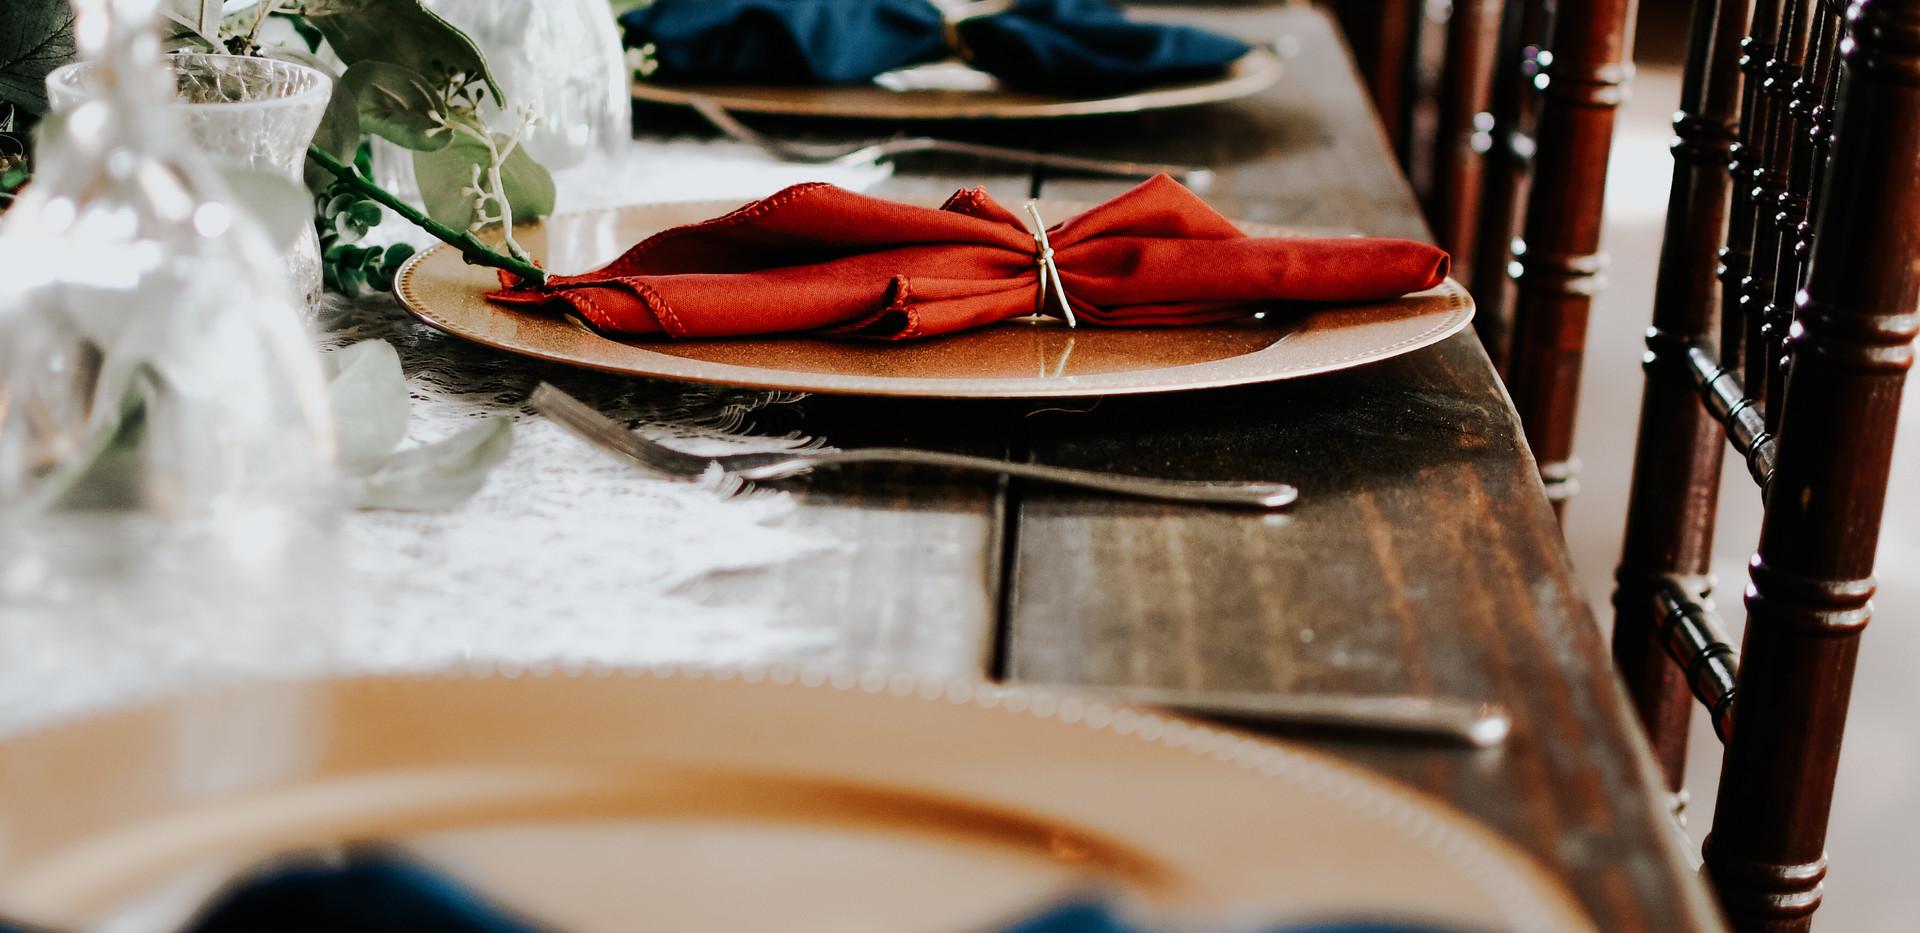 SNEAKS-Chrissyannphotography-10.jpg